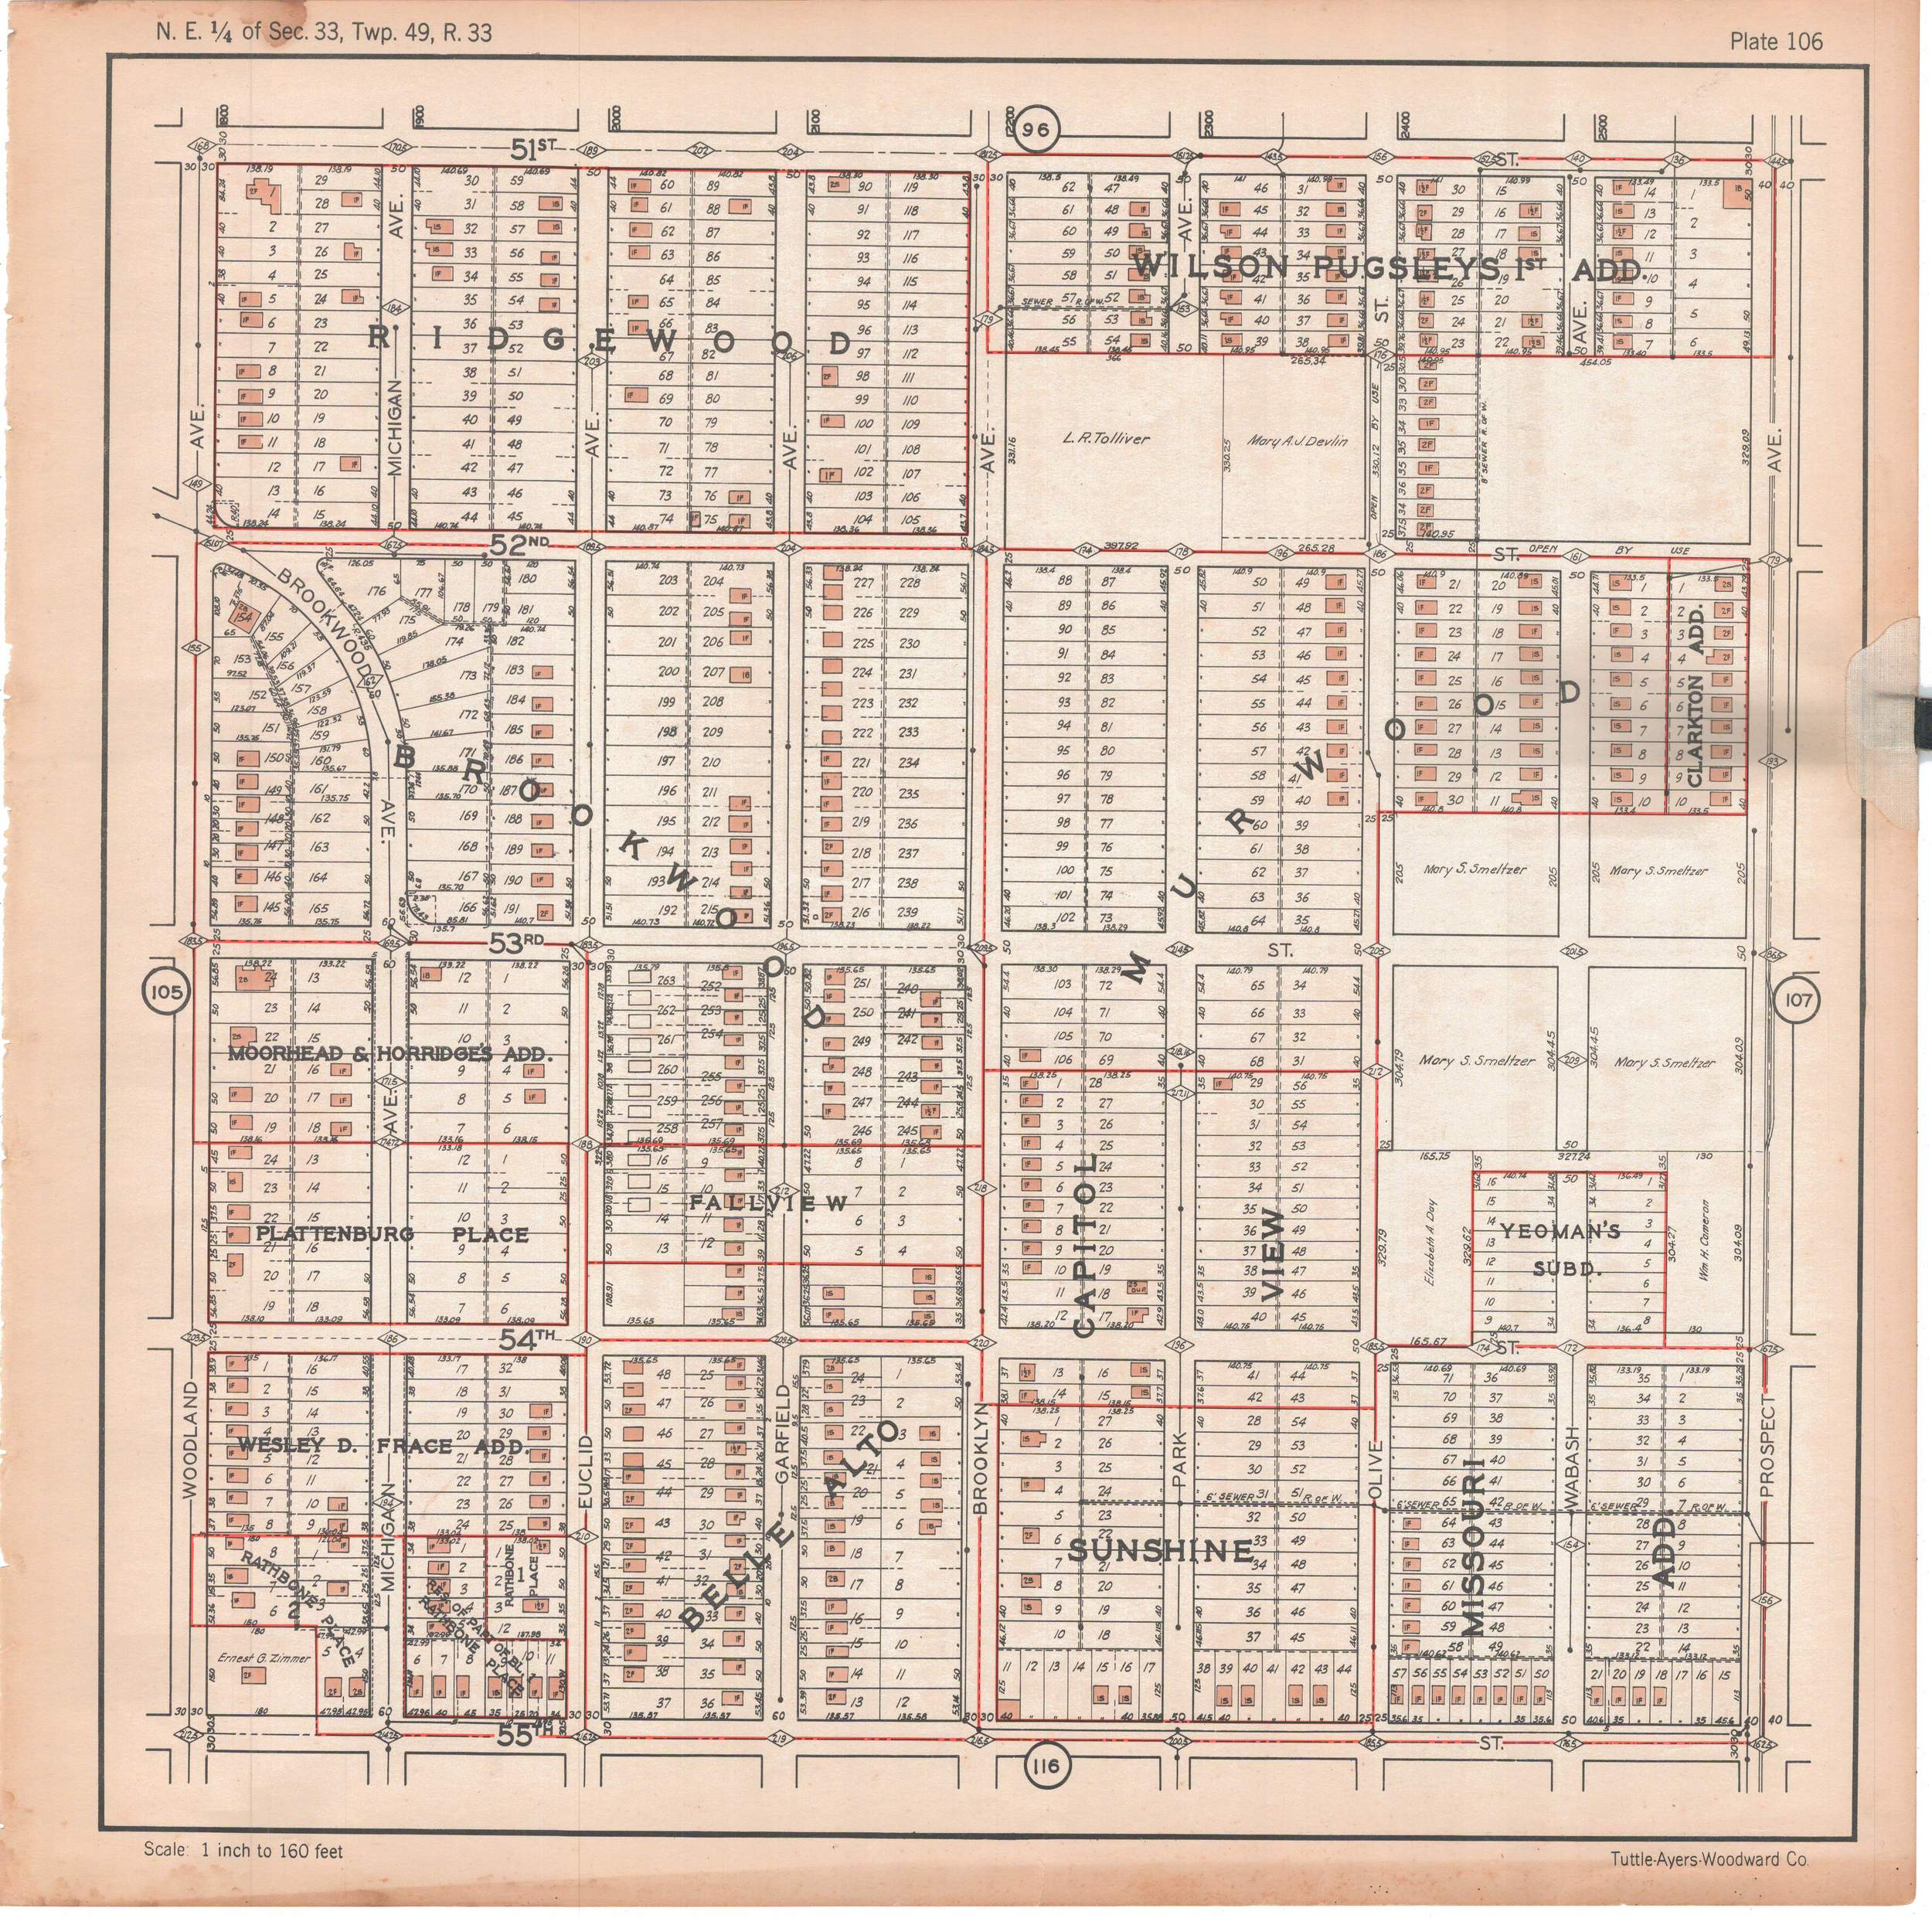 1925 TUTTLE_AYERS_Plate 106.JPG